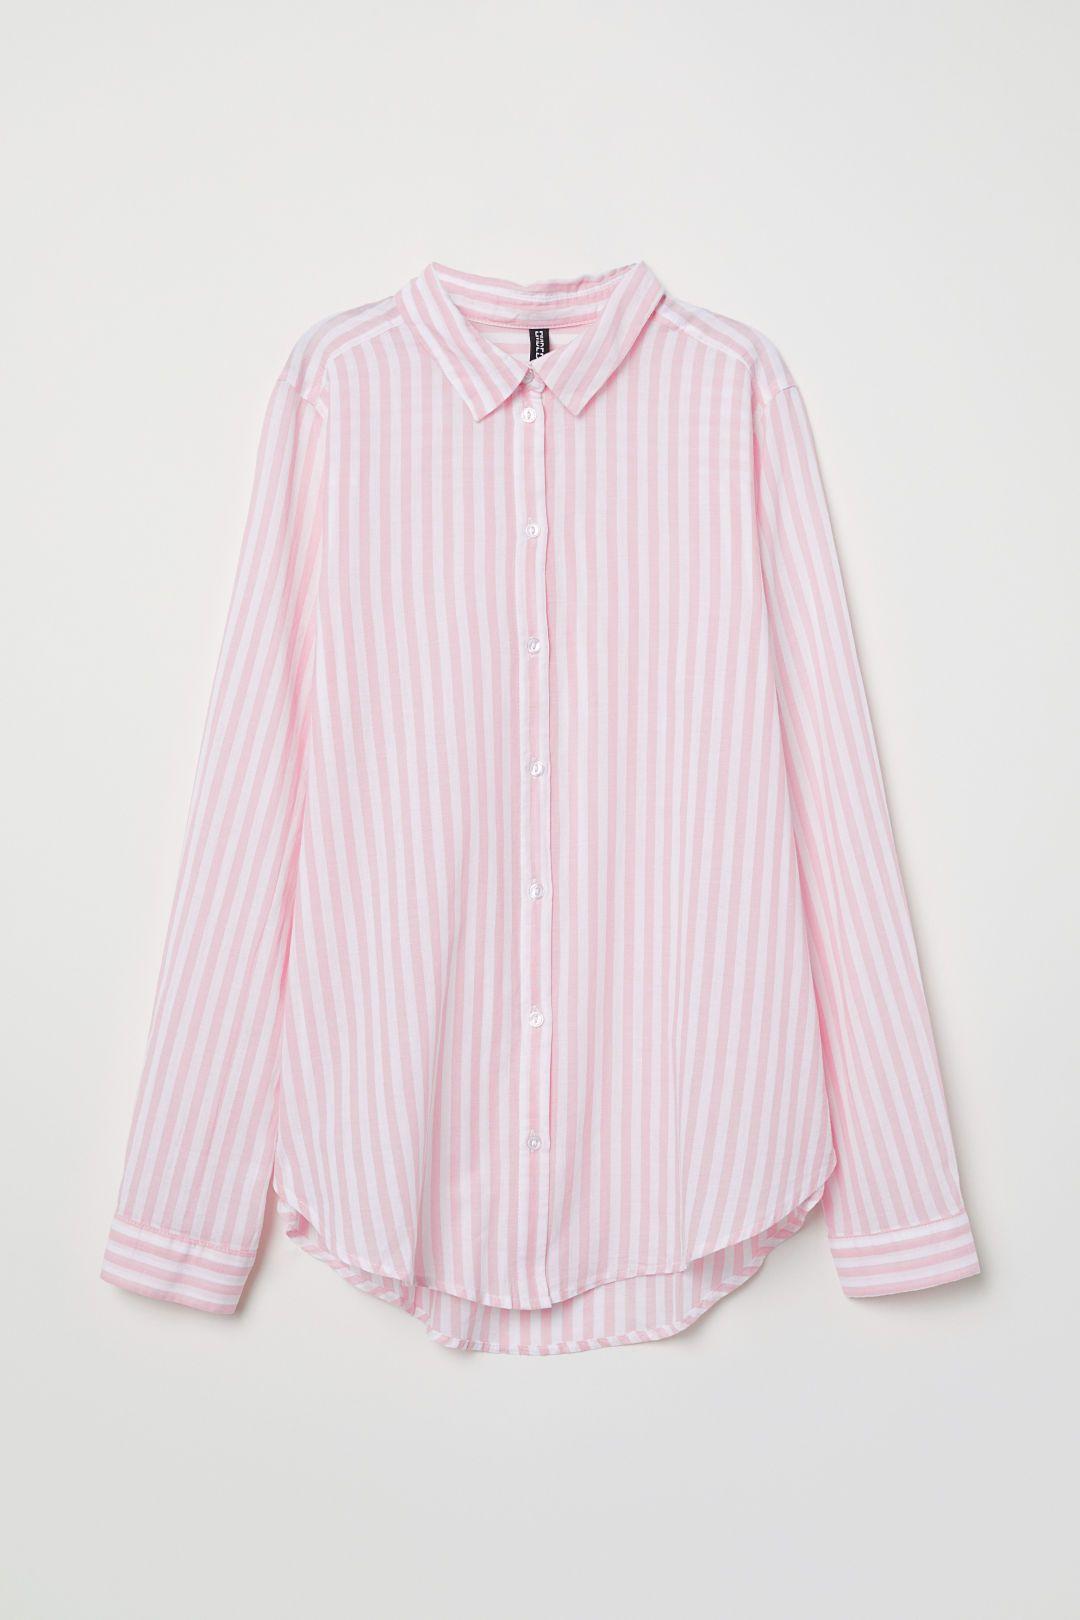 f15abe5453fe2b Cotton Shirt in 2019 | Fall/Christmas Wish List | Shirts, Striped ...